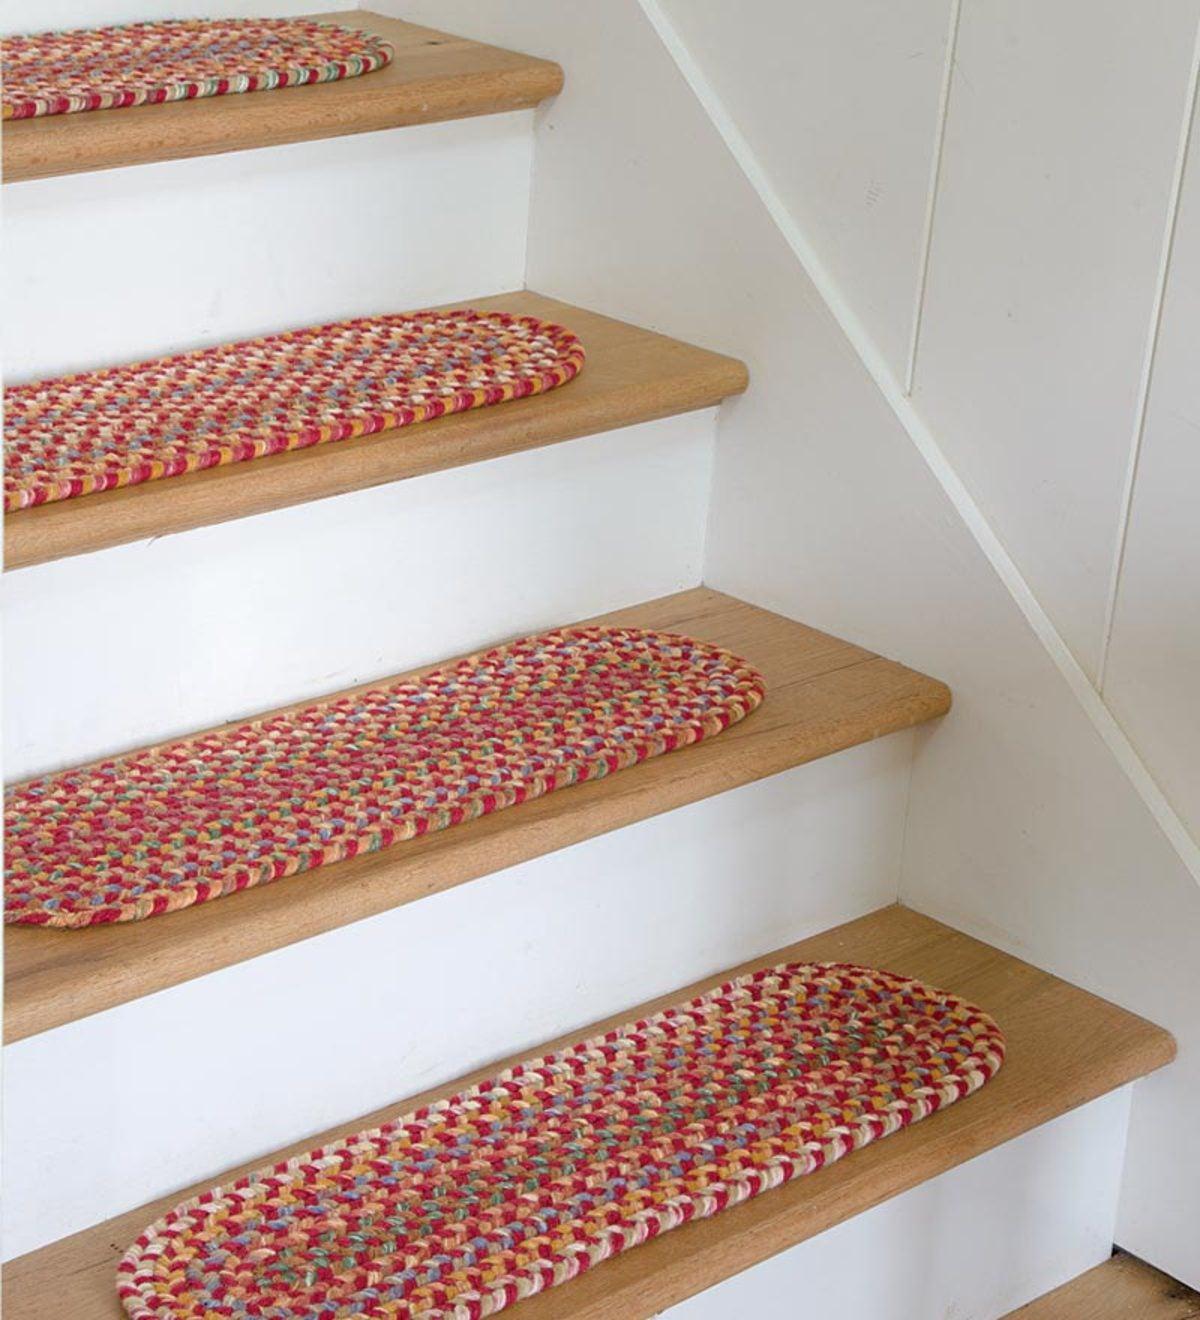 Genial Blue Ridge Wool Oval Braided Stair Tread, 8